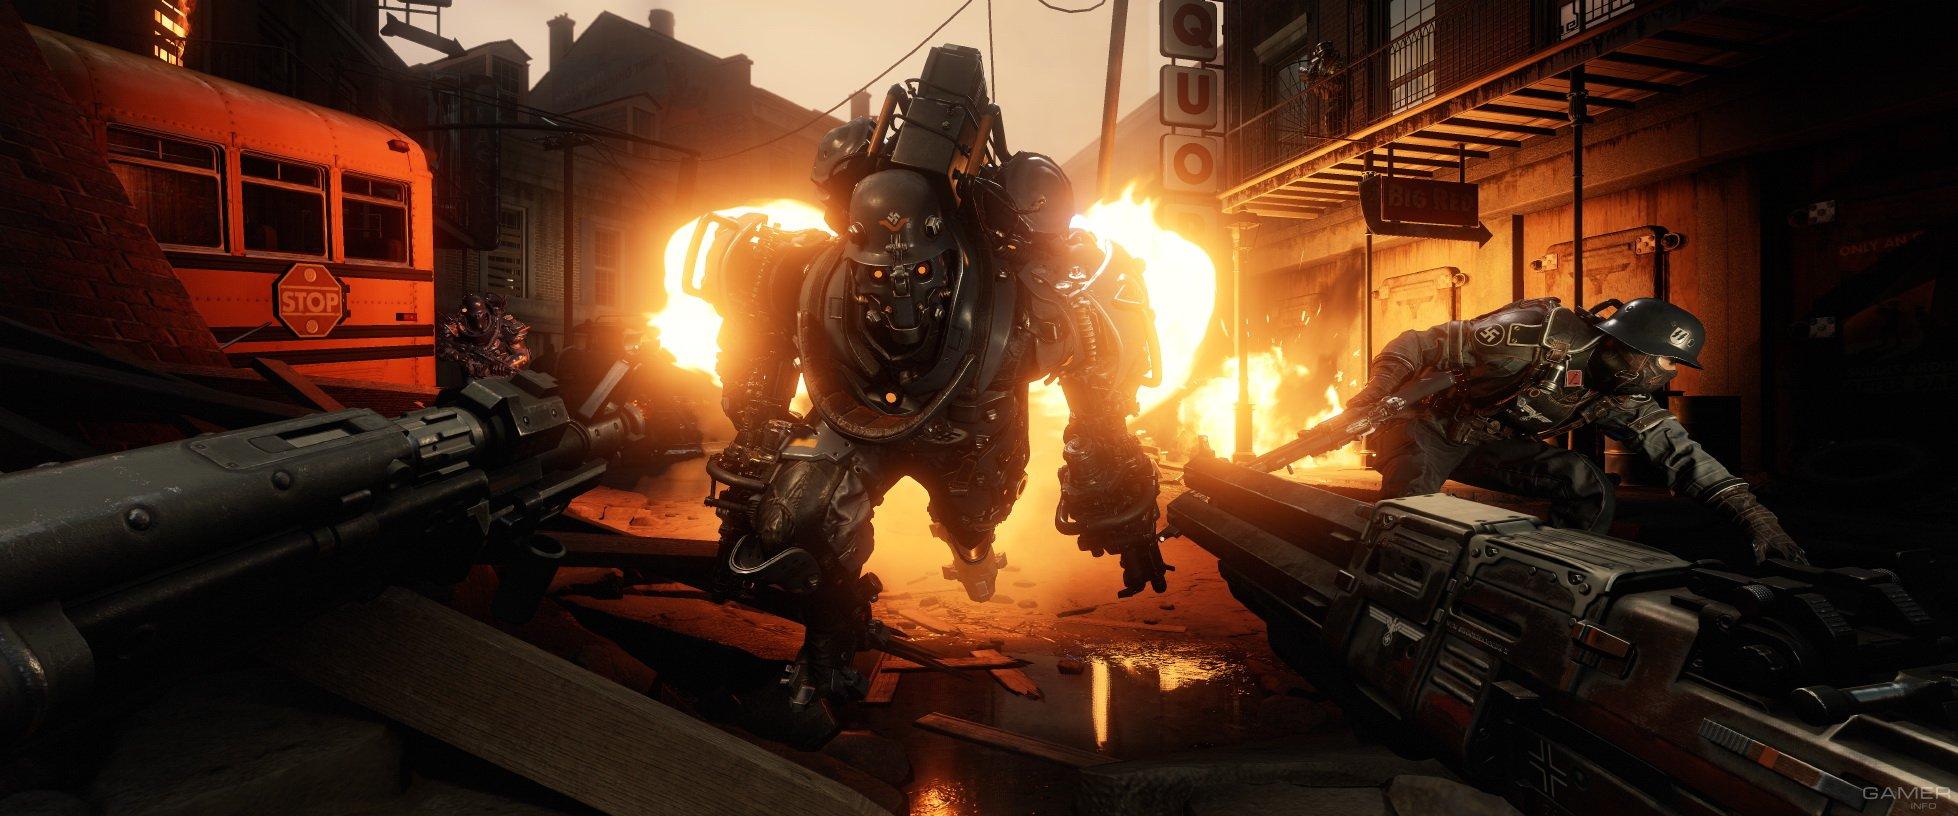 Даты выхода всех DLC для Wolfenstein II: The New Colossus